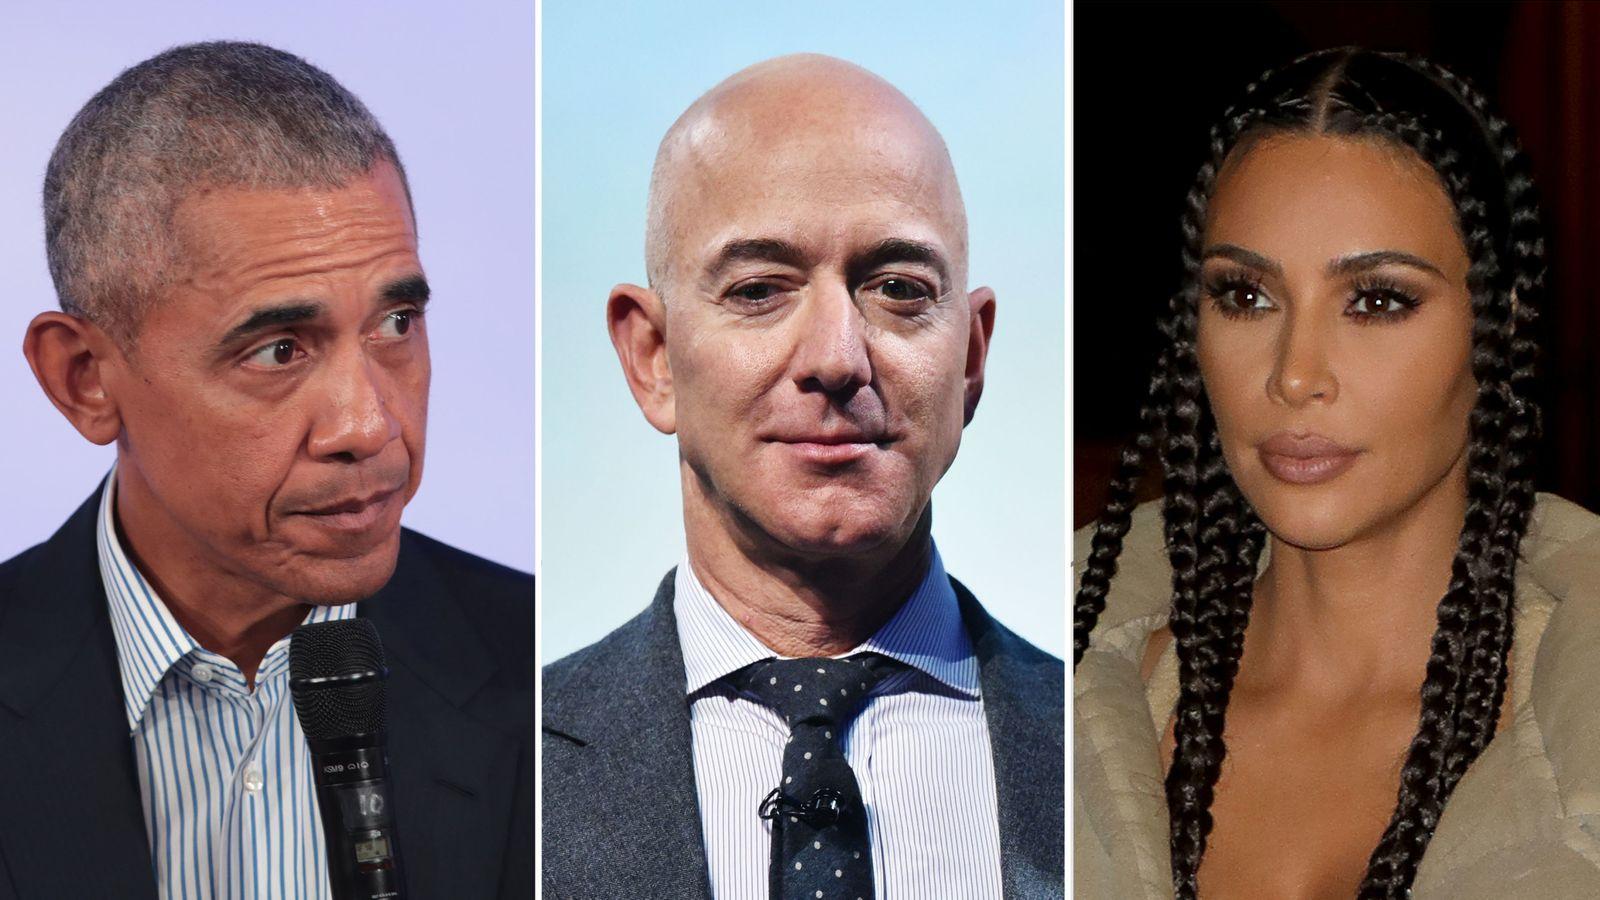 (L-R) Barack Obama, Jeff Bezos, Kim Kardashian